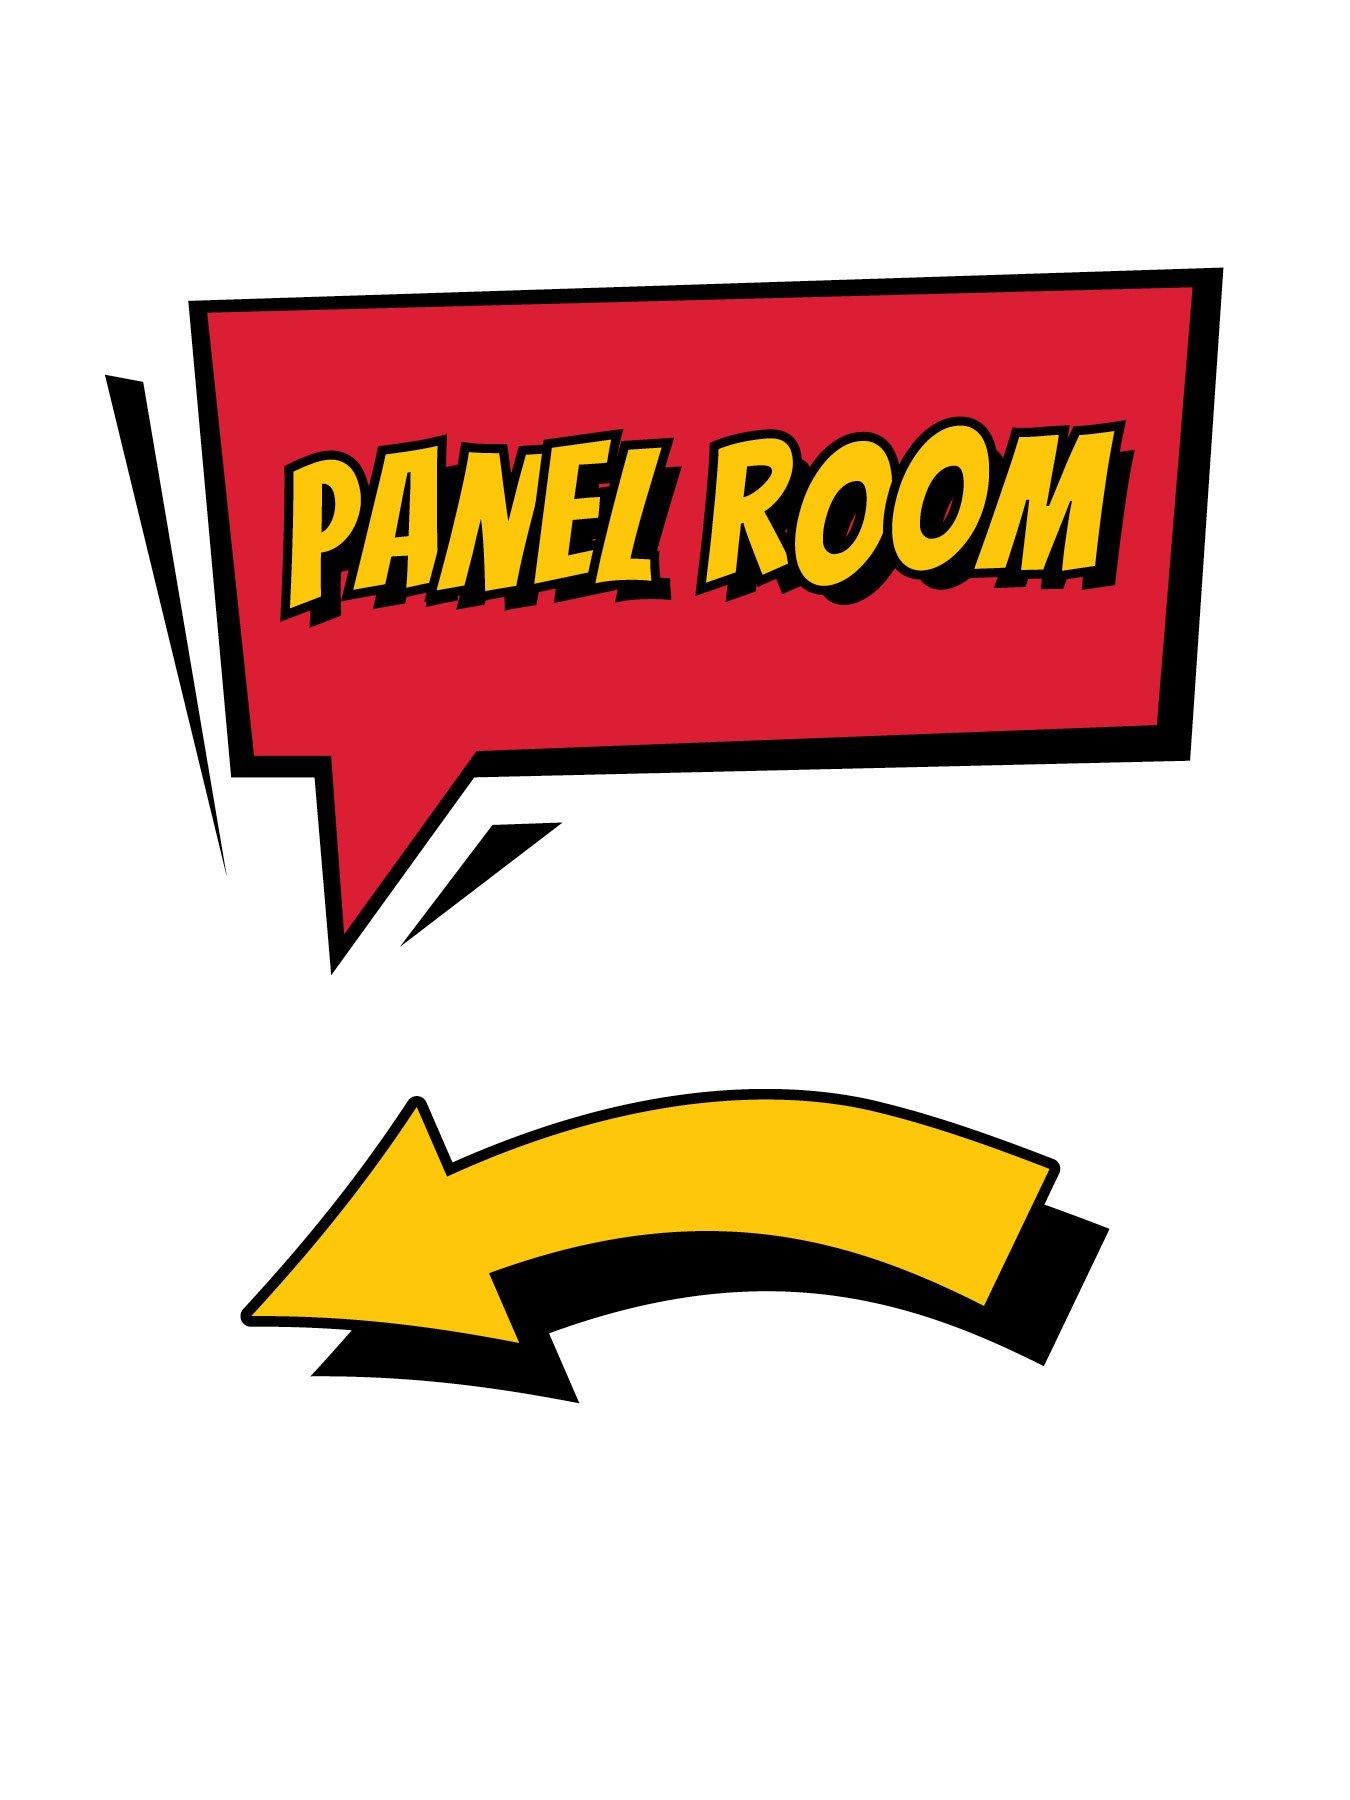 panel-room-wayfinding-9x12